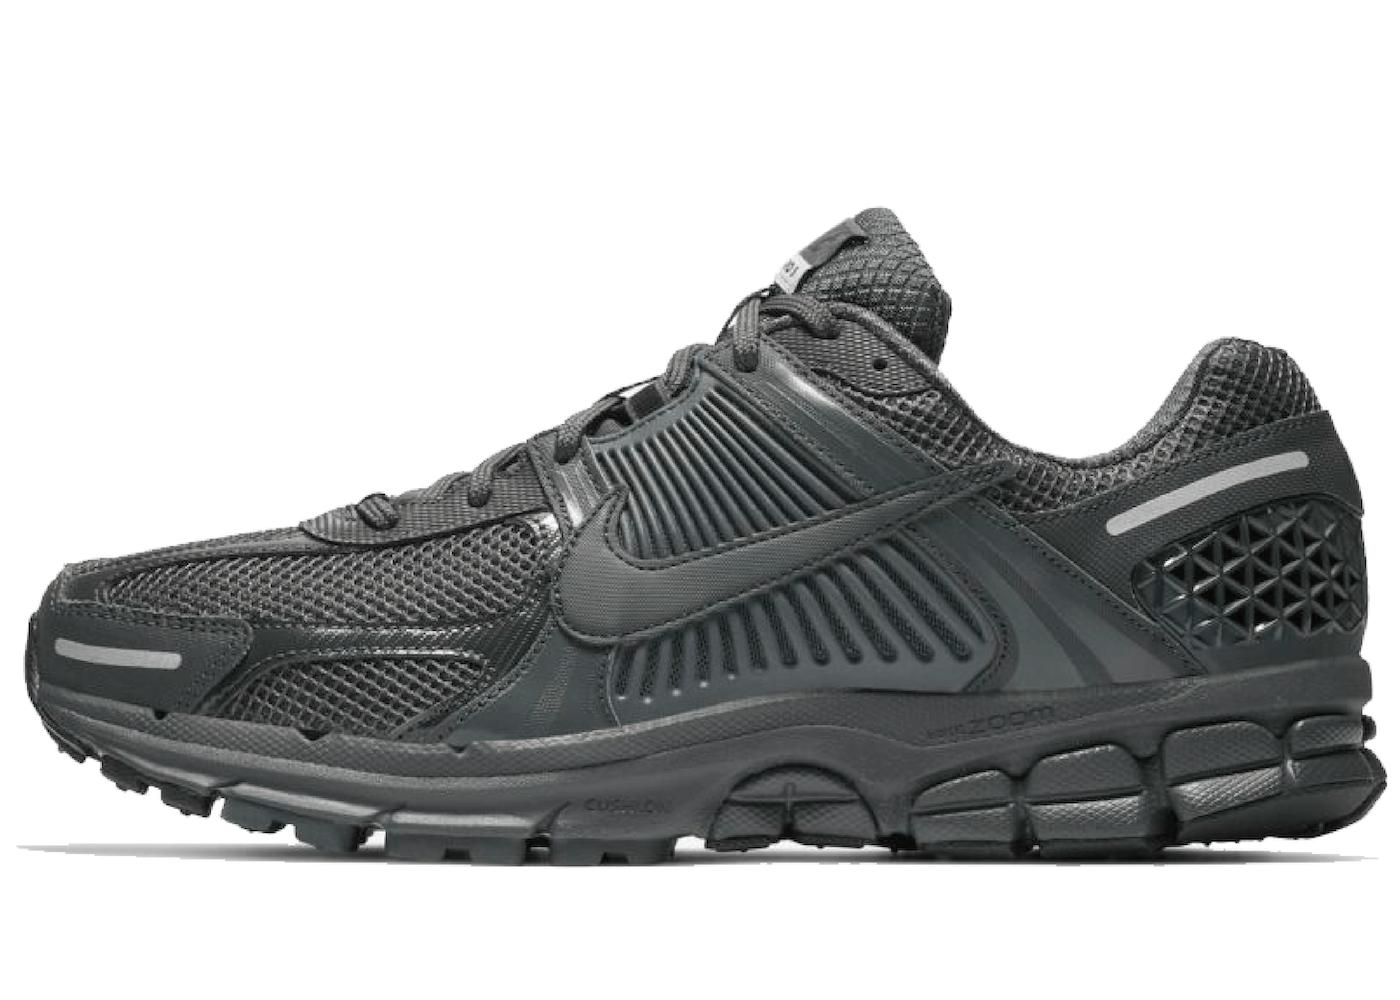 Nike Zoom Vomero 5 Anthracite Black Wolf Grayの写真